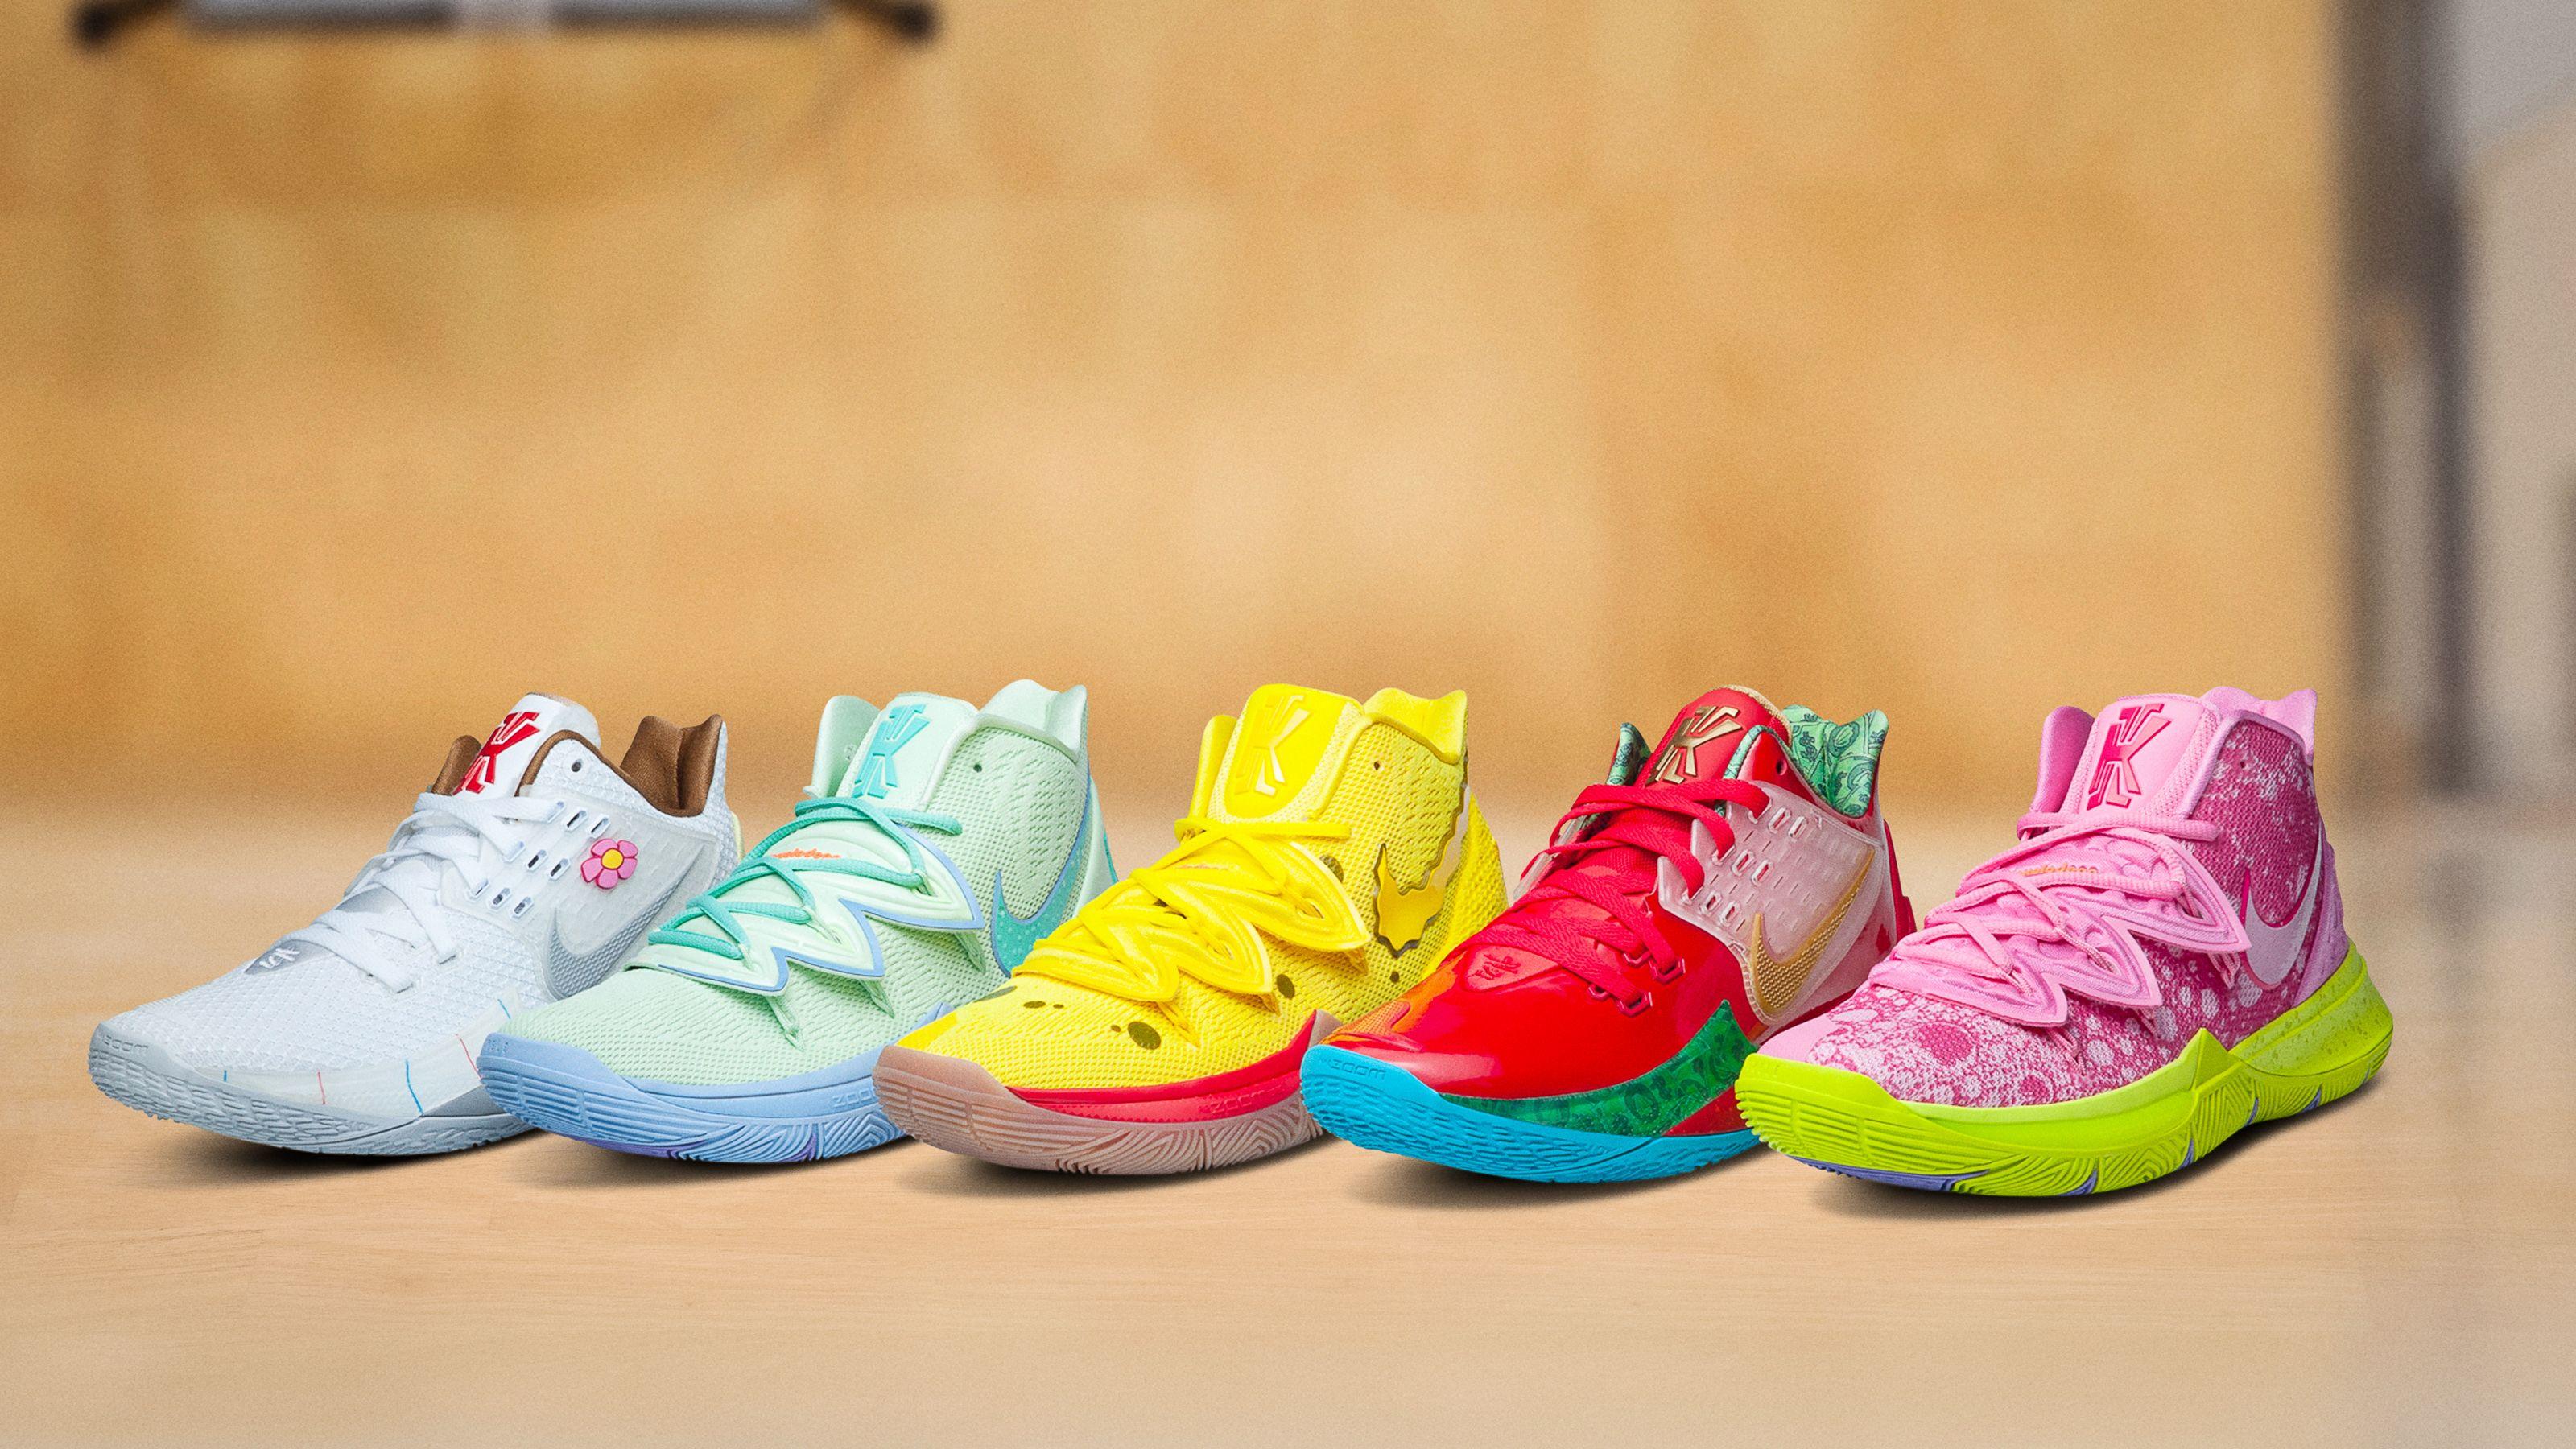 Nike's New SpongeBob x Kyrie Irving